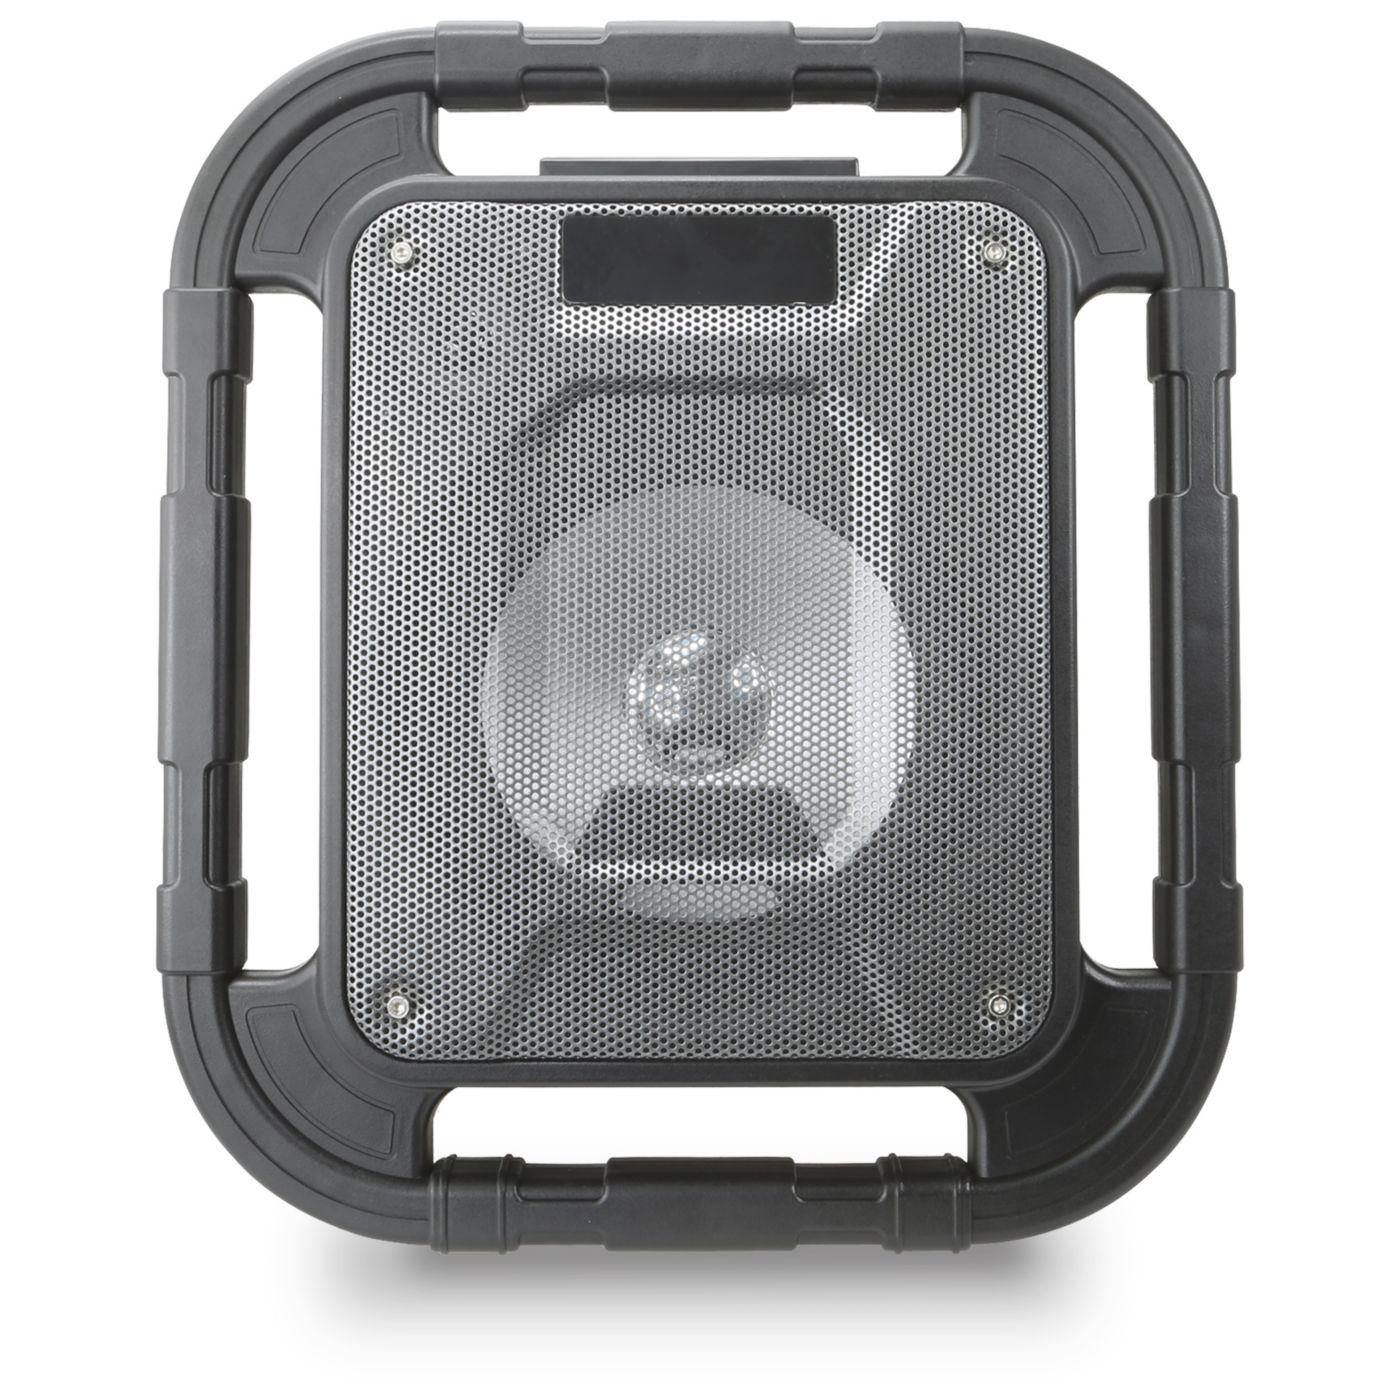 iLive Wireless Water Resistant Tailgate Speaker